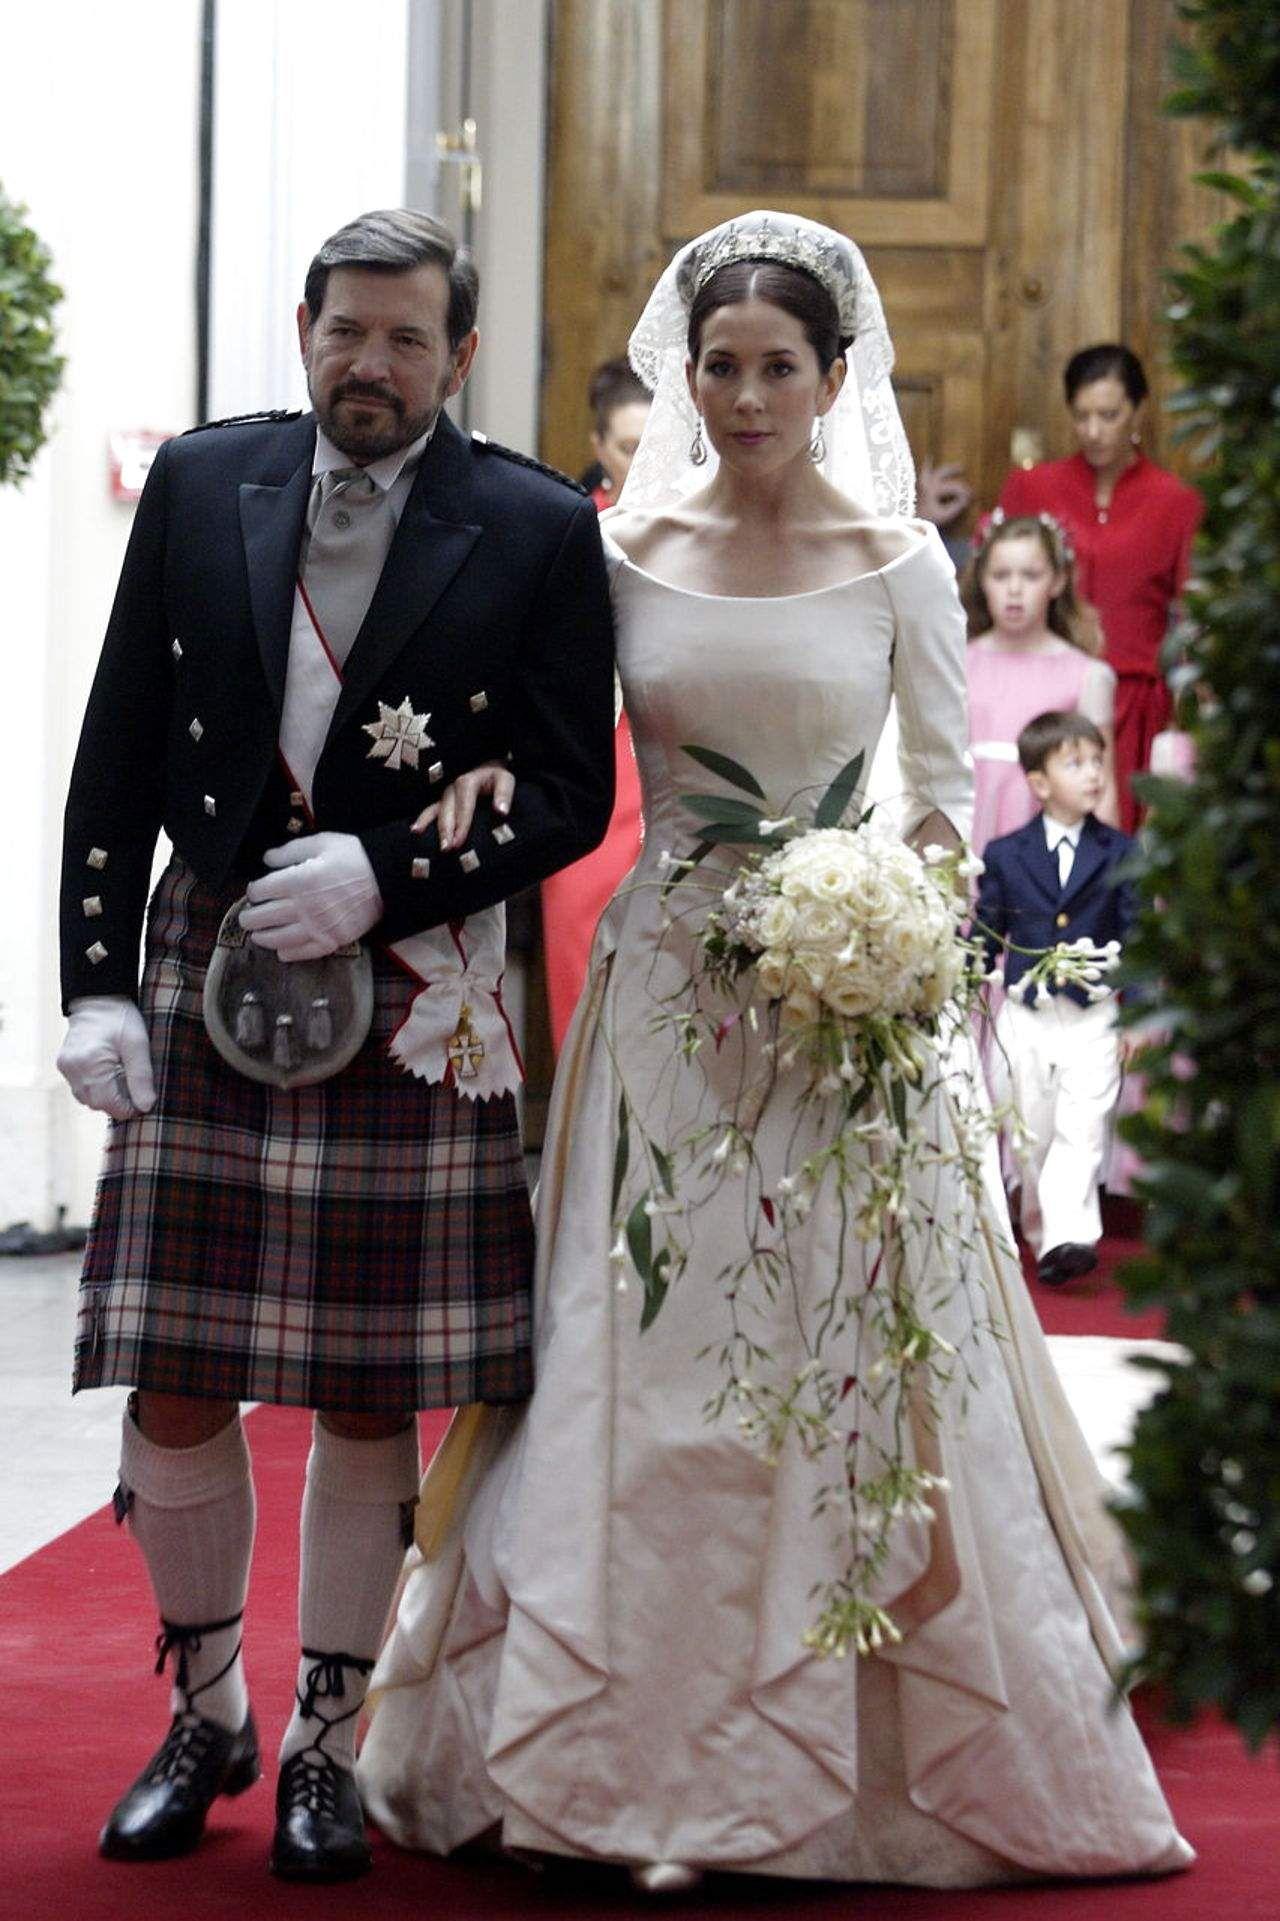 Obruchenie I Svadba Kronprinca Frederika I Meri Donaldson 735 Fotek Royal Wedding Dress Royal Wedding Gowns Royal Brides [ 1921 x 1280 Pixel ]